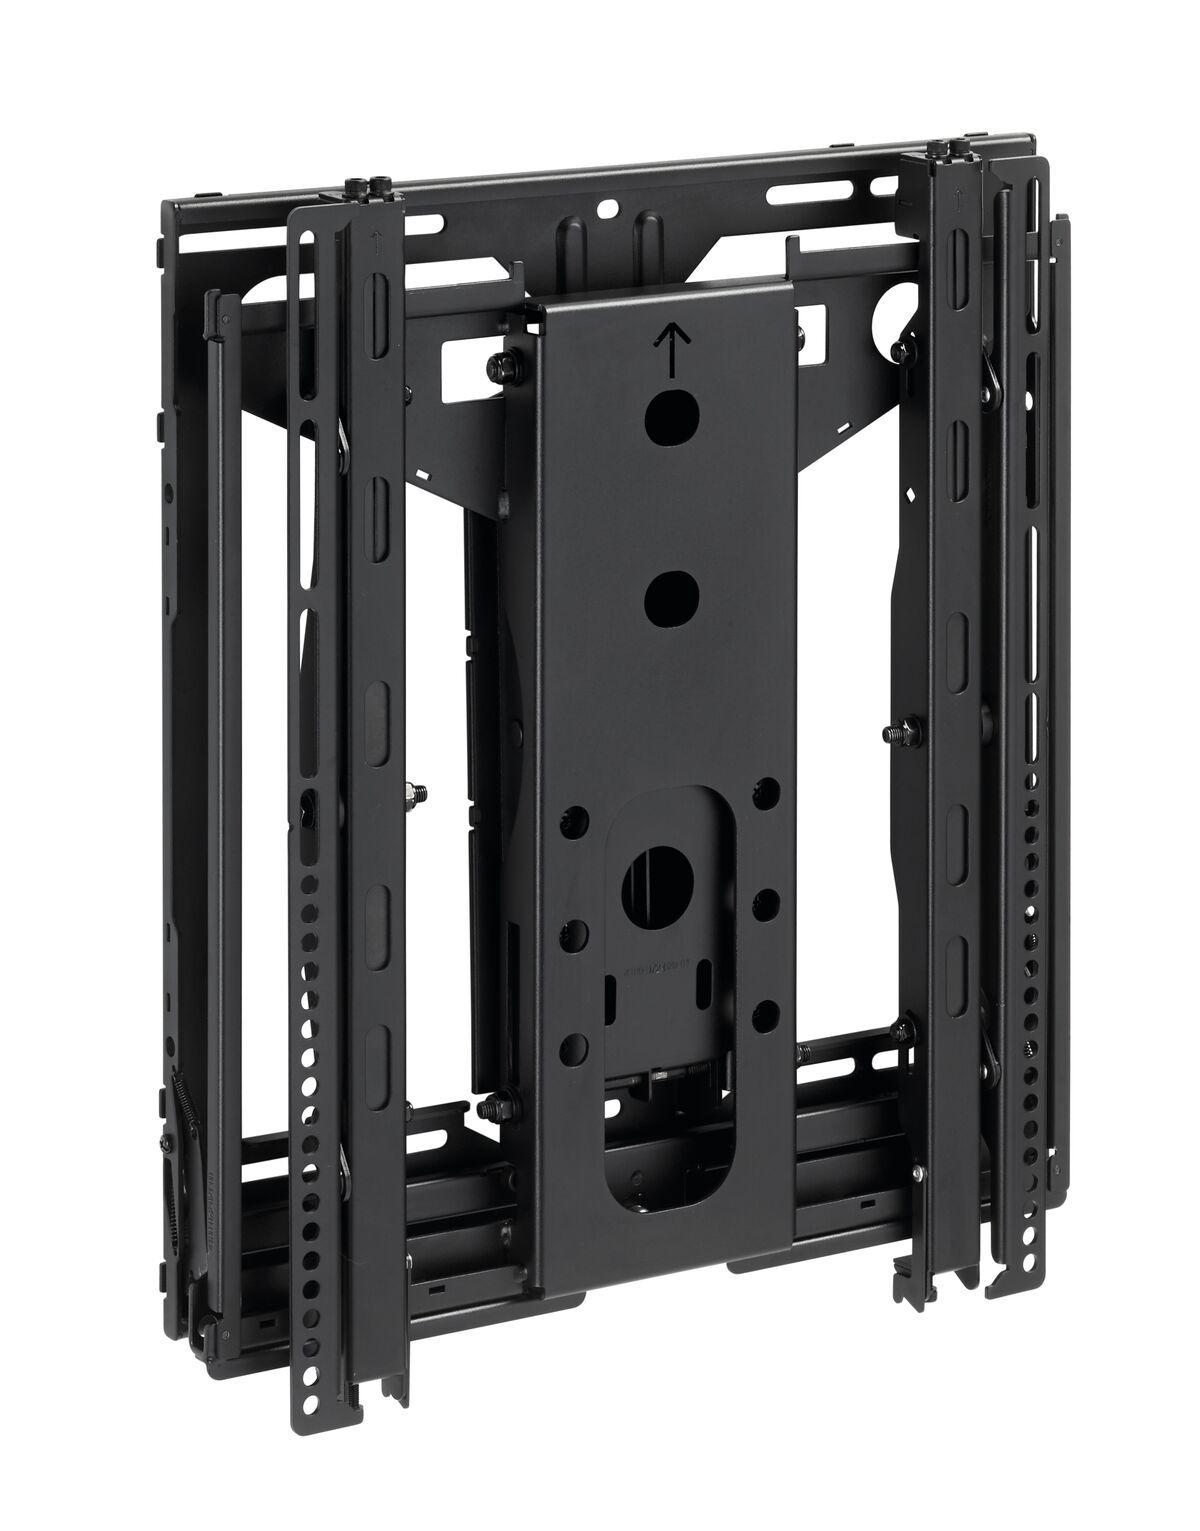 Vogel's PFW 6885 Modulo videowall pop-out a parete per schermi con posizionamento verticale - Detail